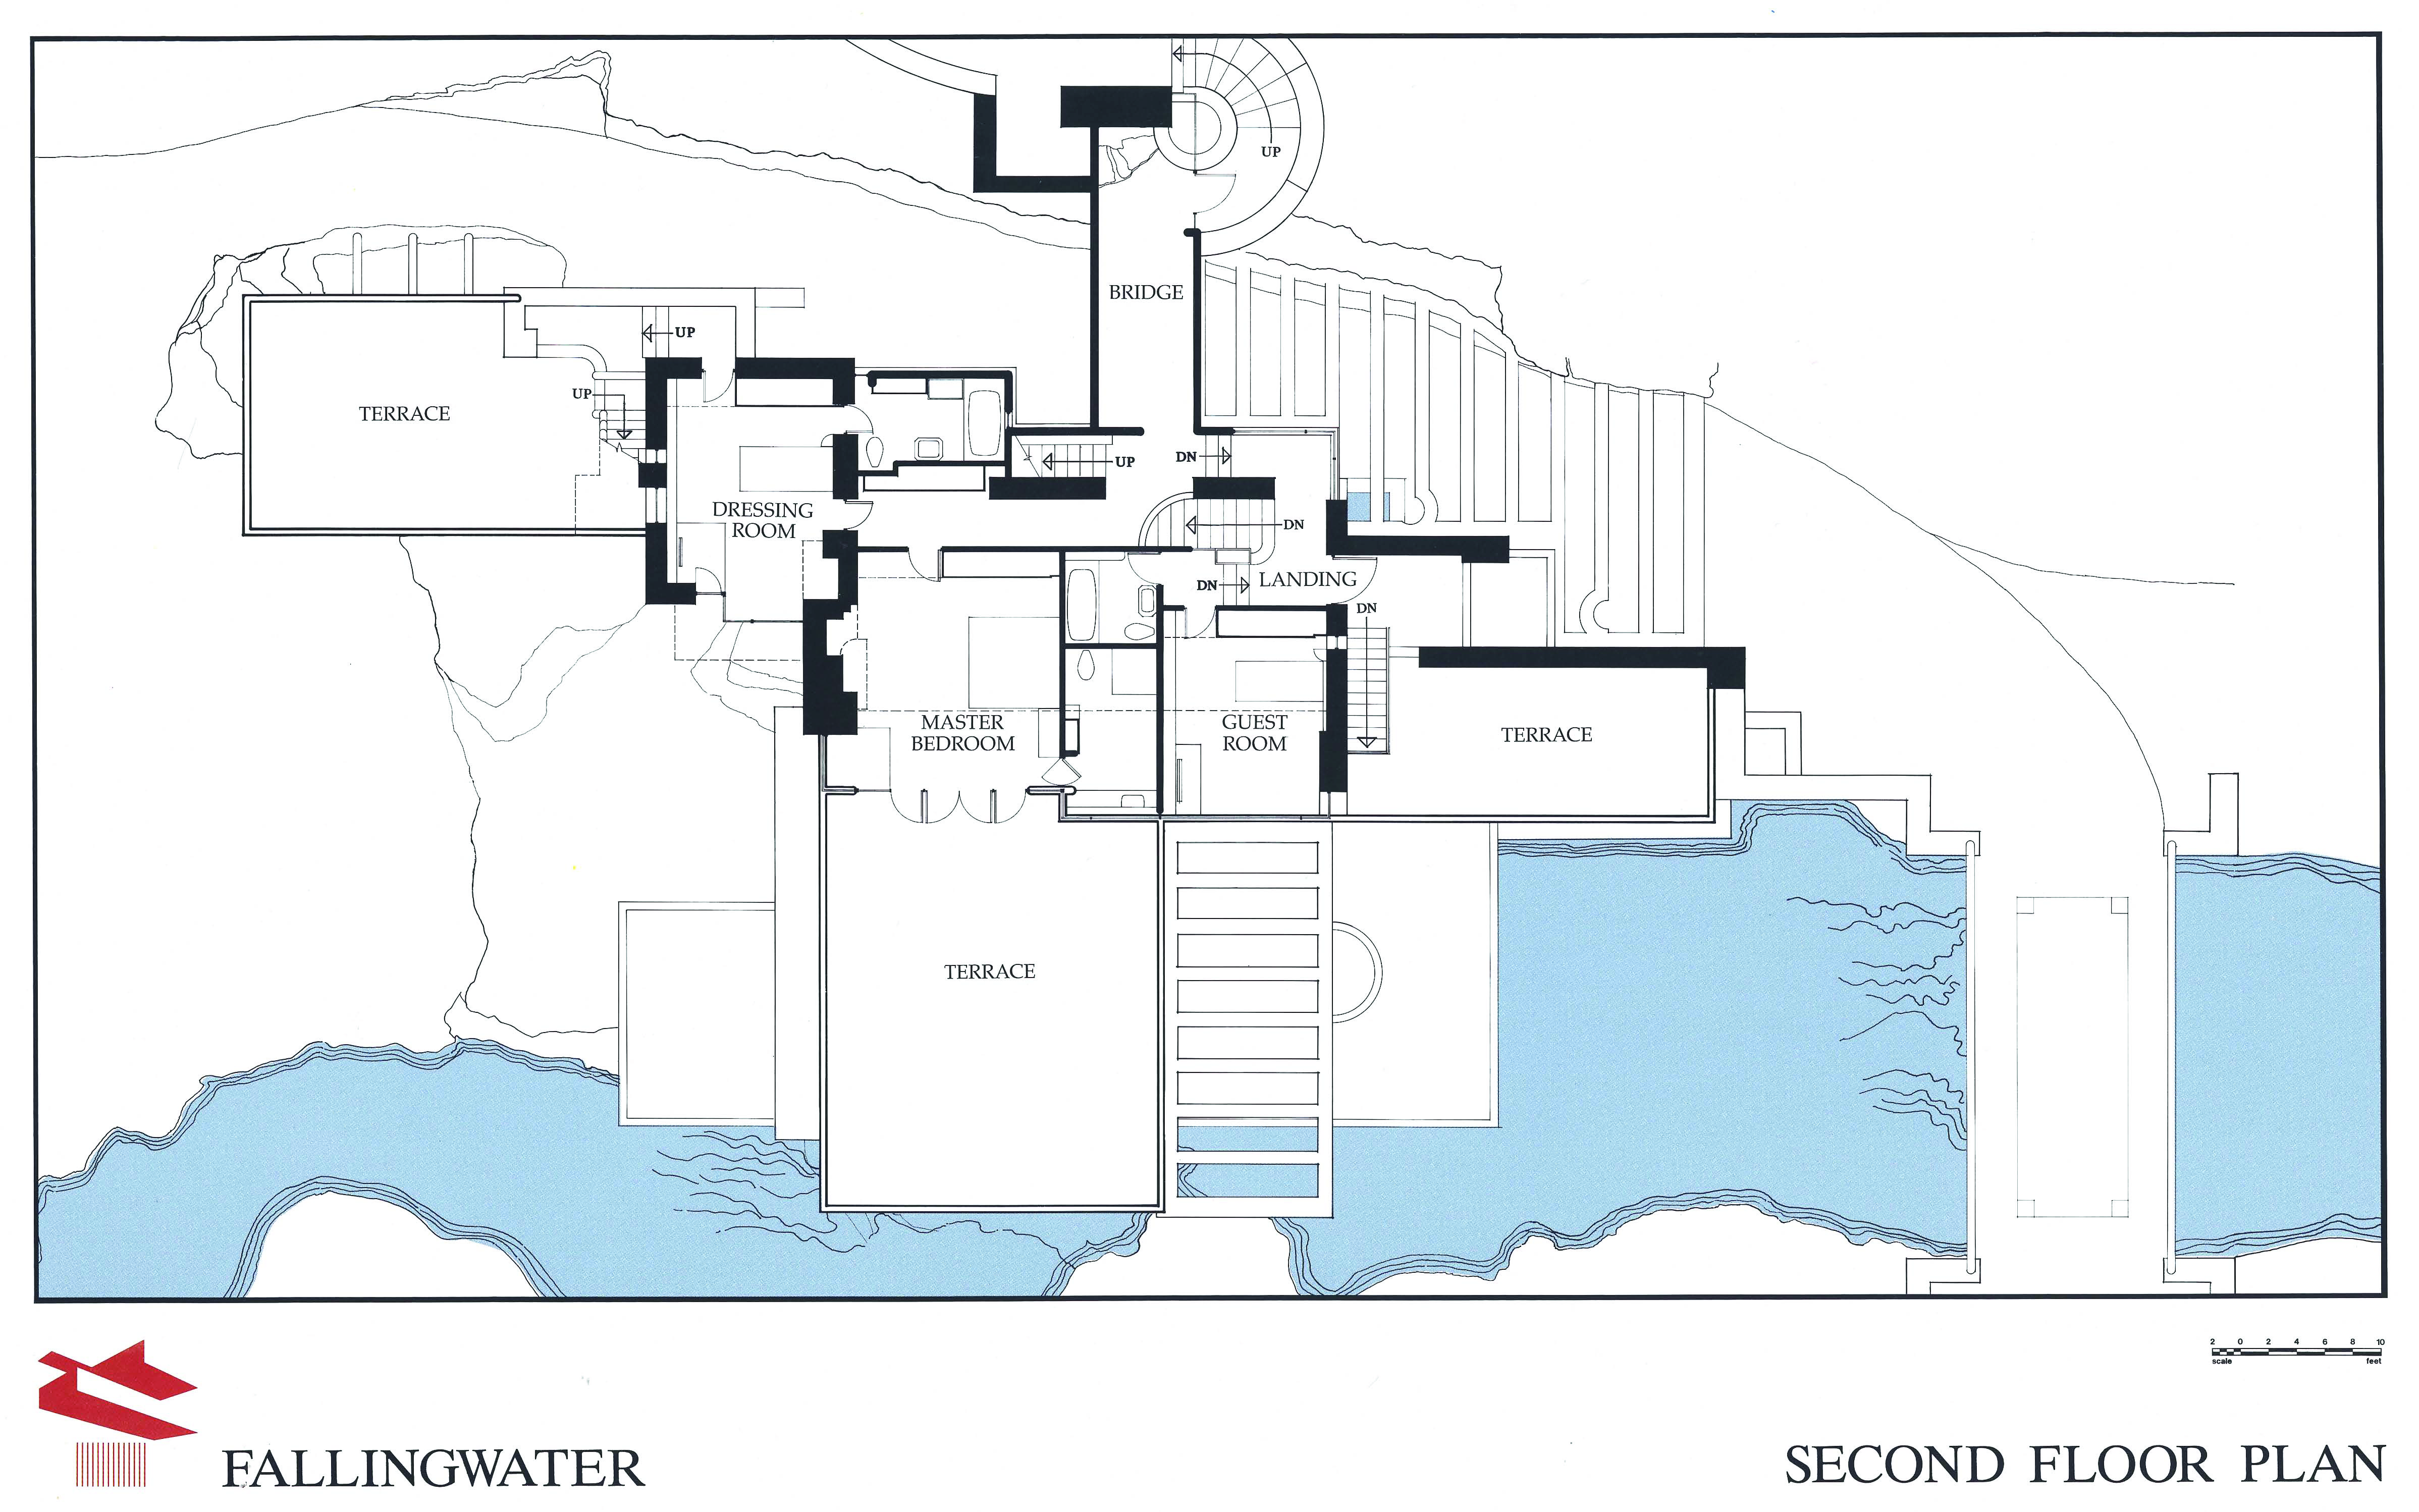 fallingwater-org-arch-plans-western-penn-conservancy1